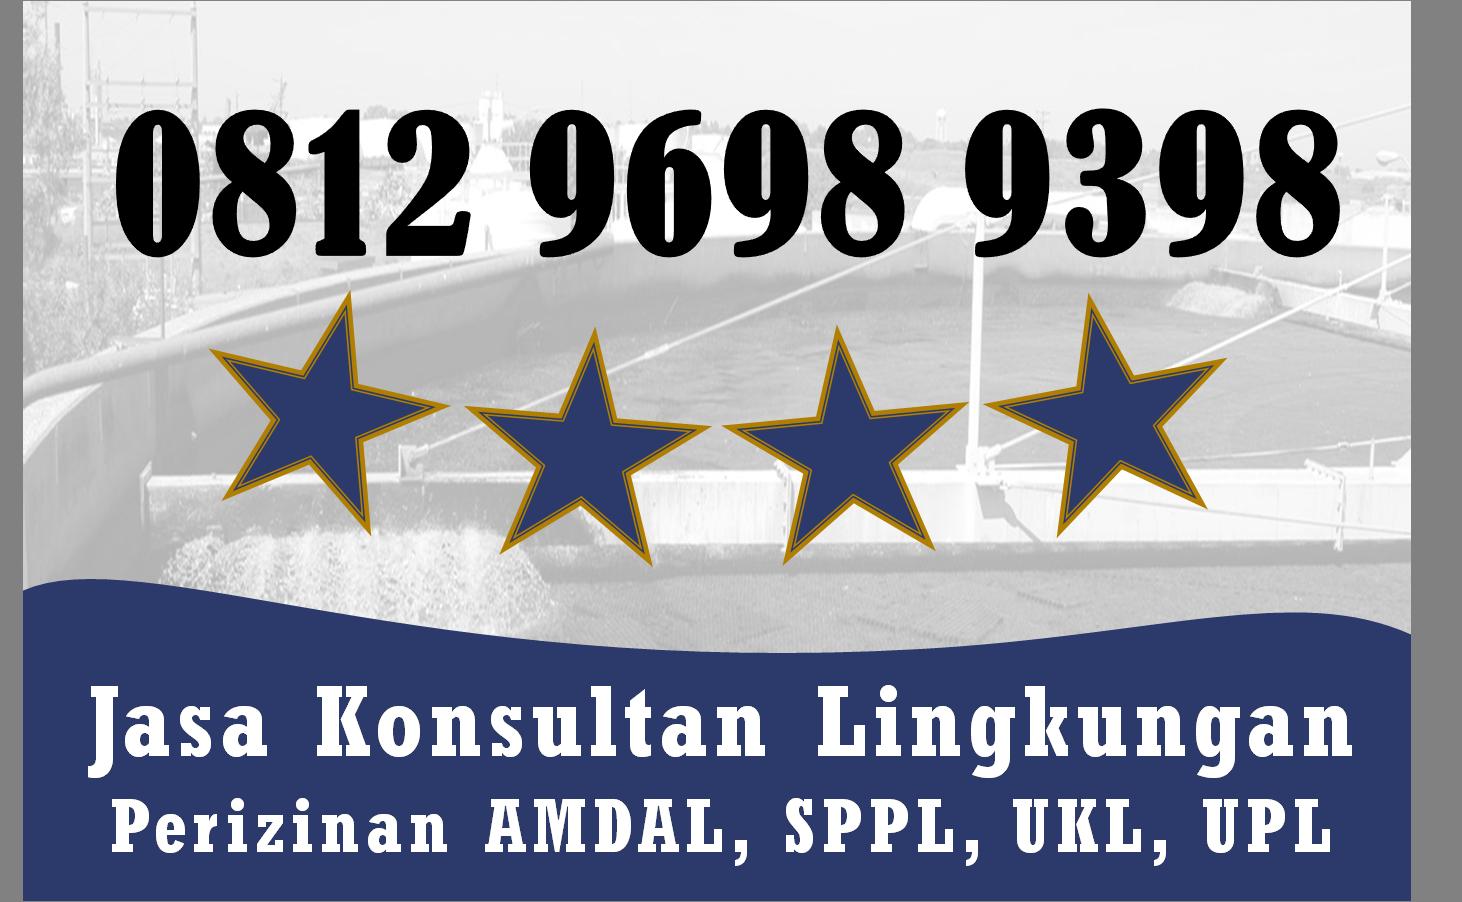 Pesan Disini Telp Wa 0812 9698 9398 Ukl Upl Bengkel Motor Kab Tapanuli Utara Sumatera Utara Di 2020 Kota Bukittinggi Mobil Kota Kota Denpasar